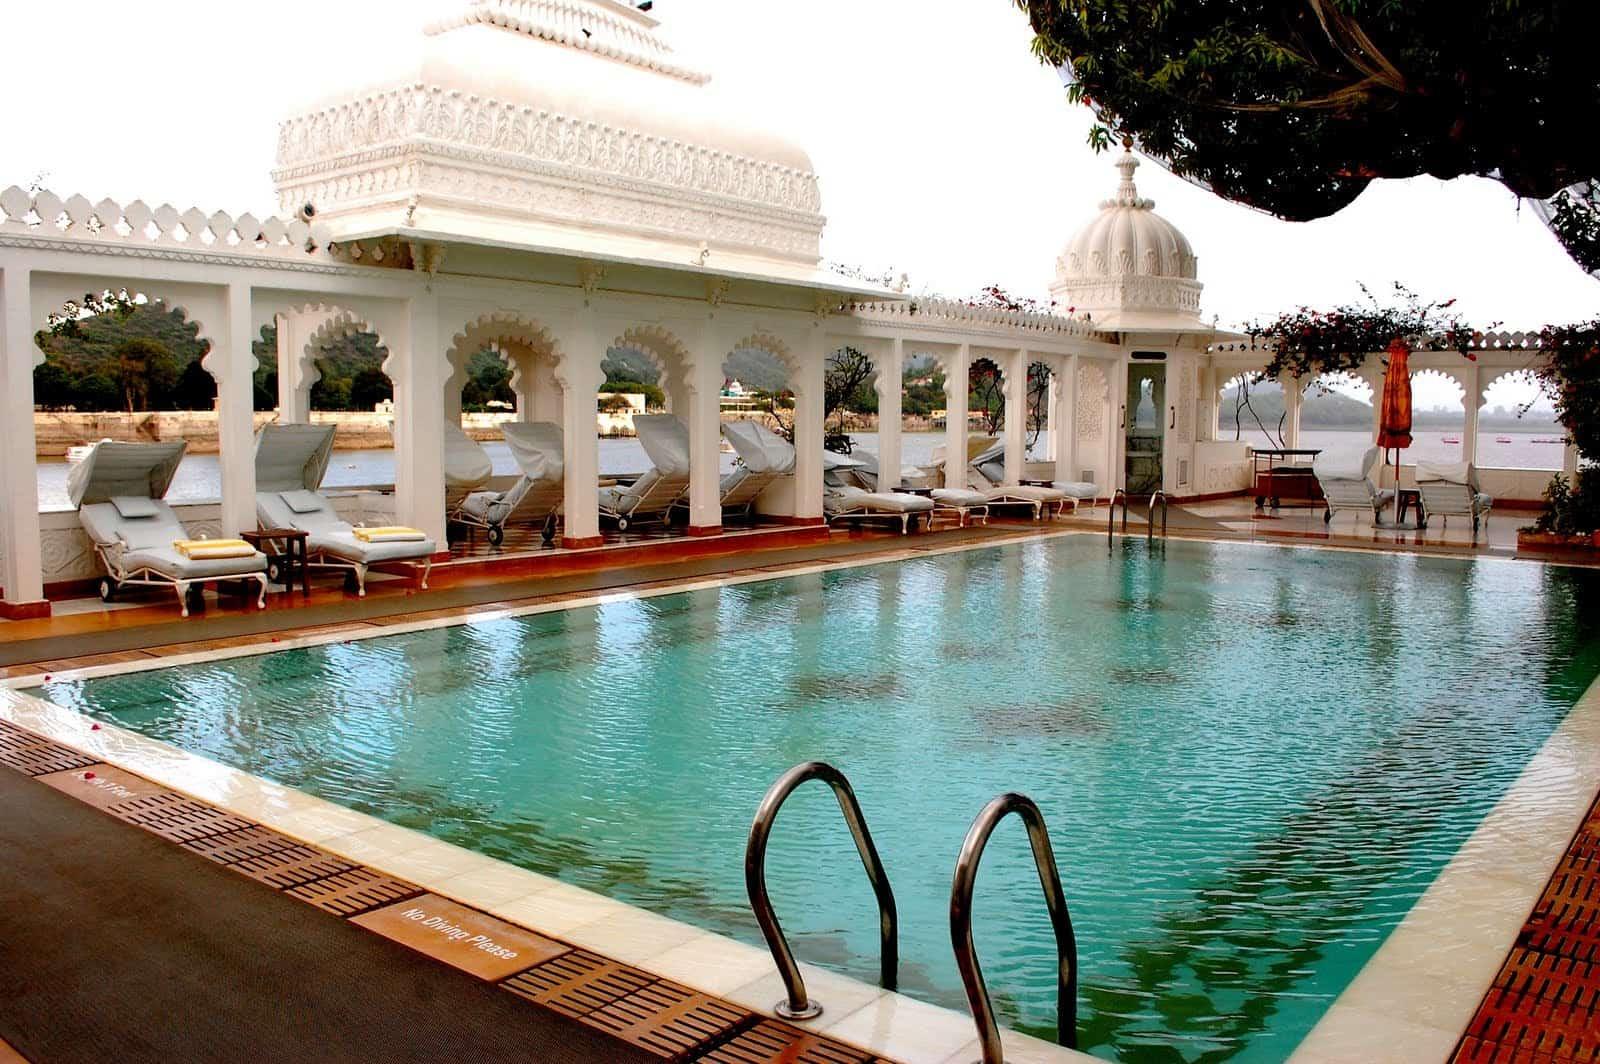 Lake Palace Hotel Udaipur Room Rates